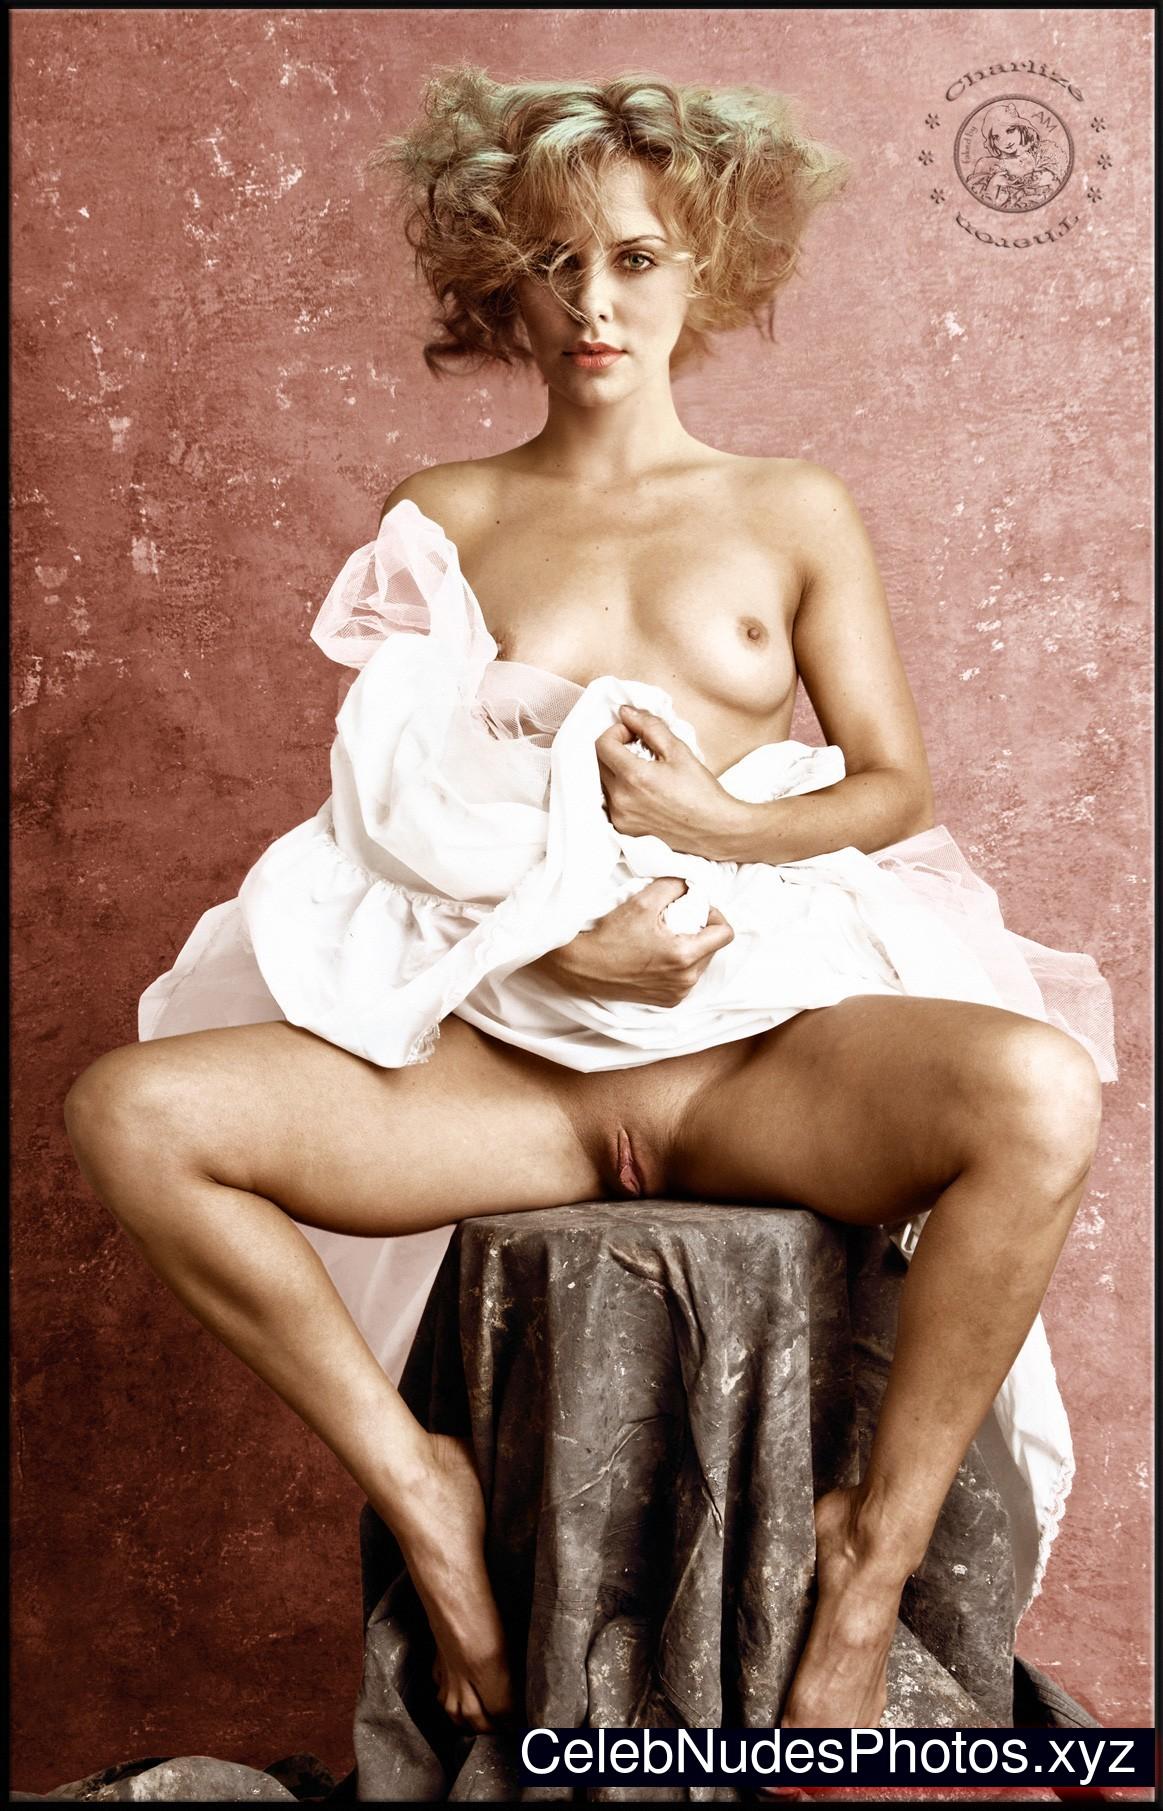 jessy mendiola fake naked pic